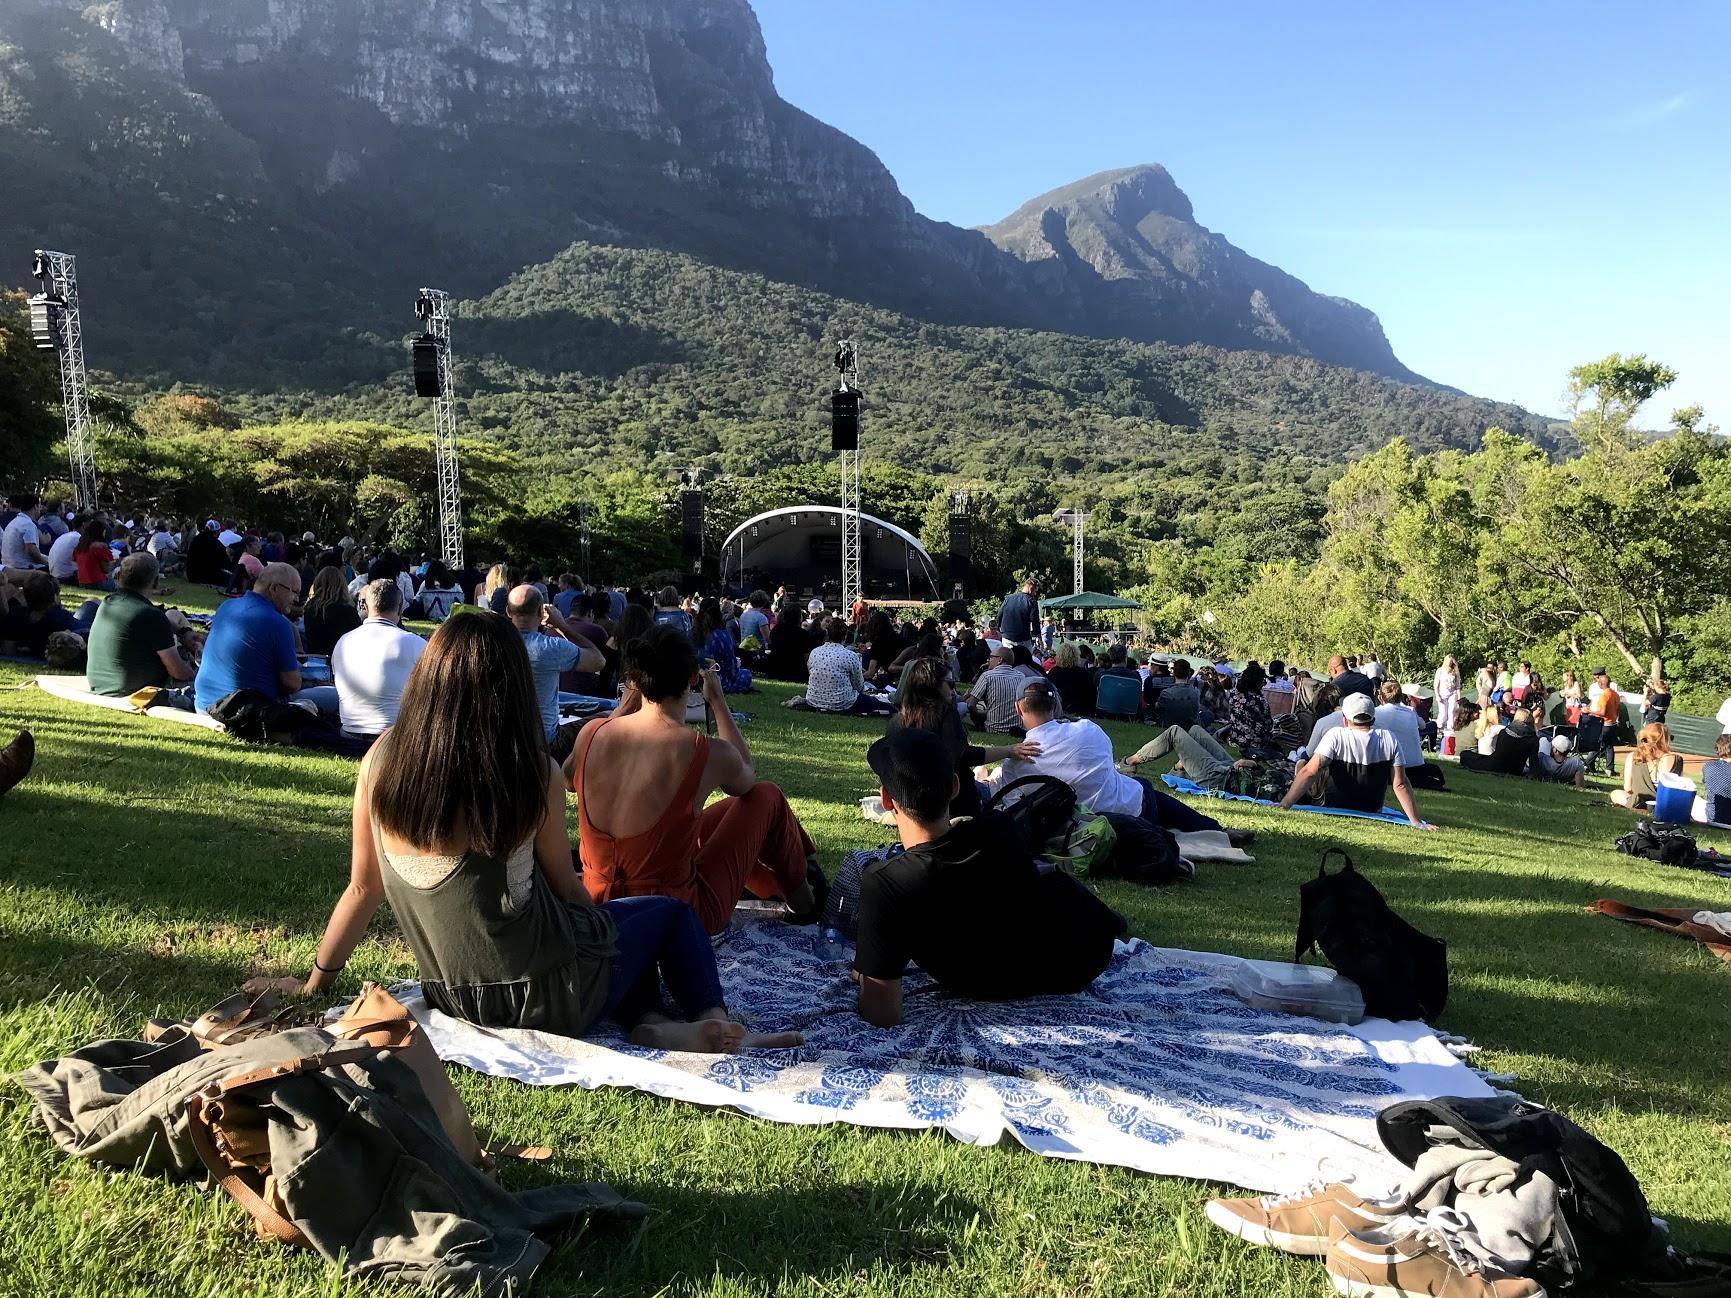 Concert at Kirstenbosch Gardens